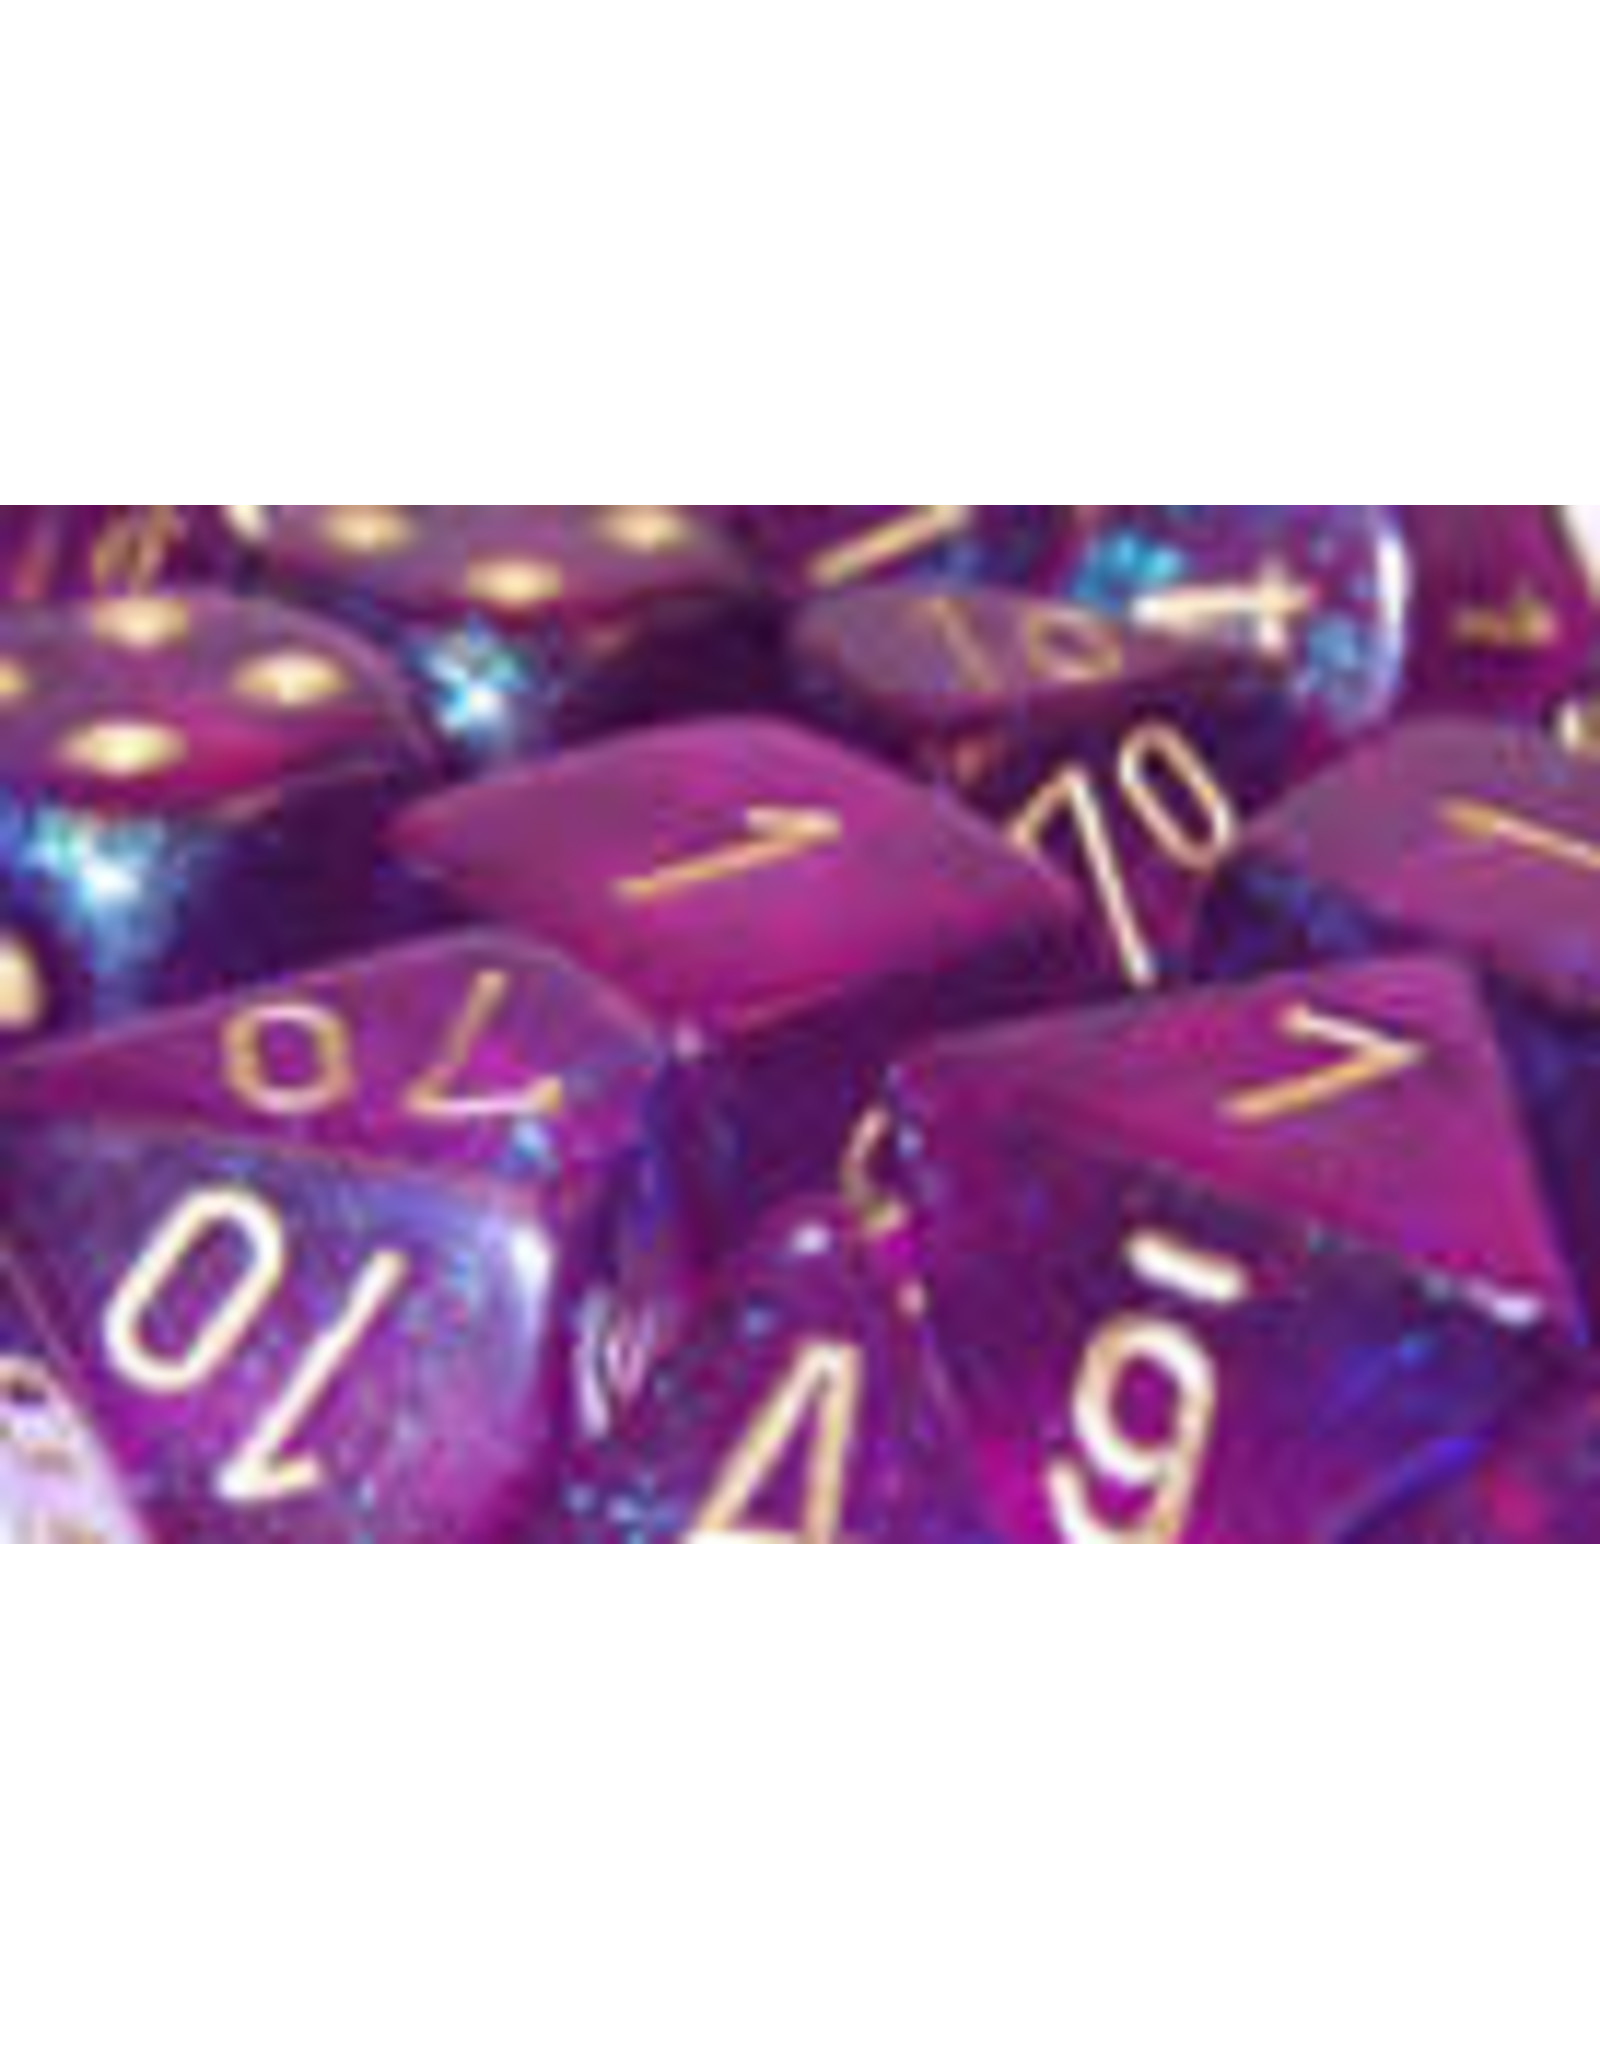 Chessex Polyhedral 7 Dice Set Borealis Royal Purple w/Gold CHX27467